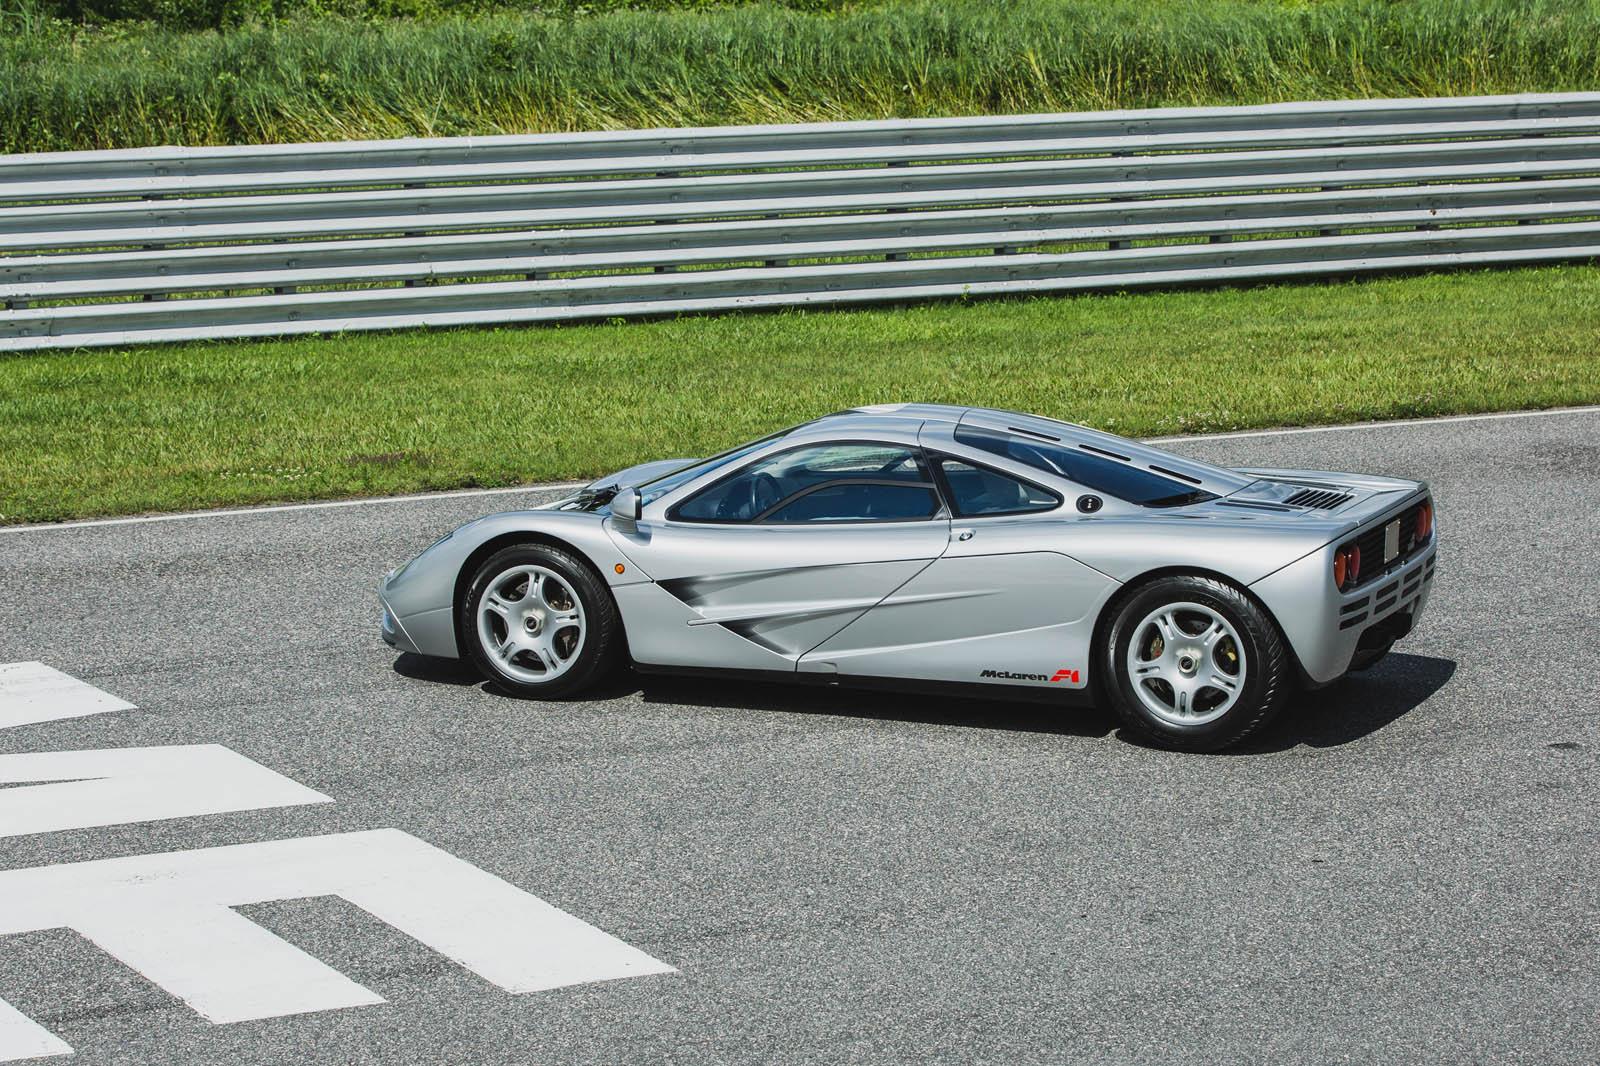 McLaren_F1-28 copy